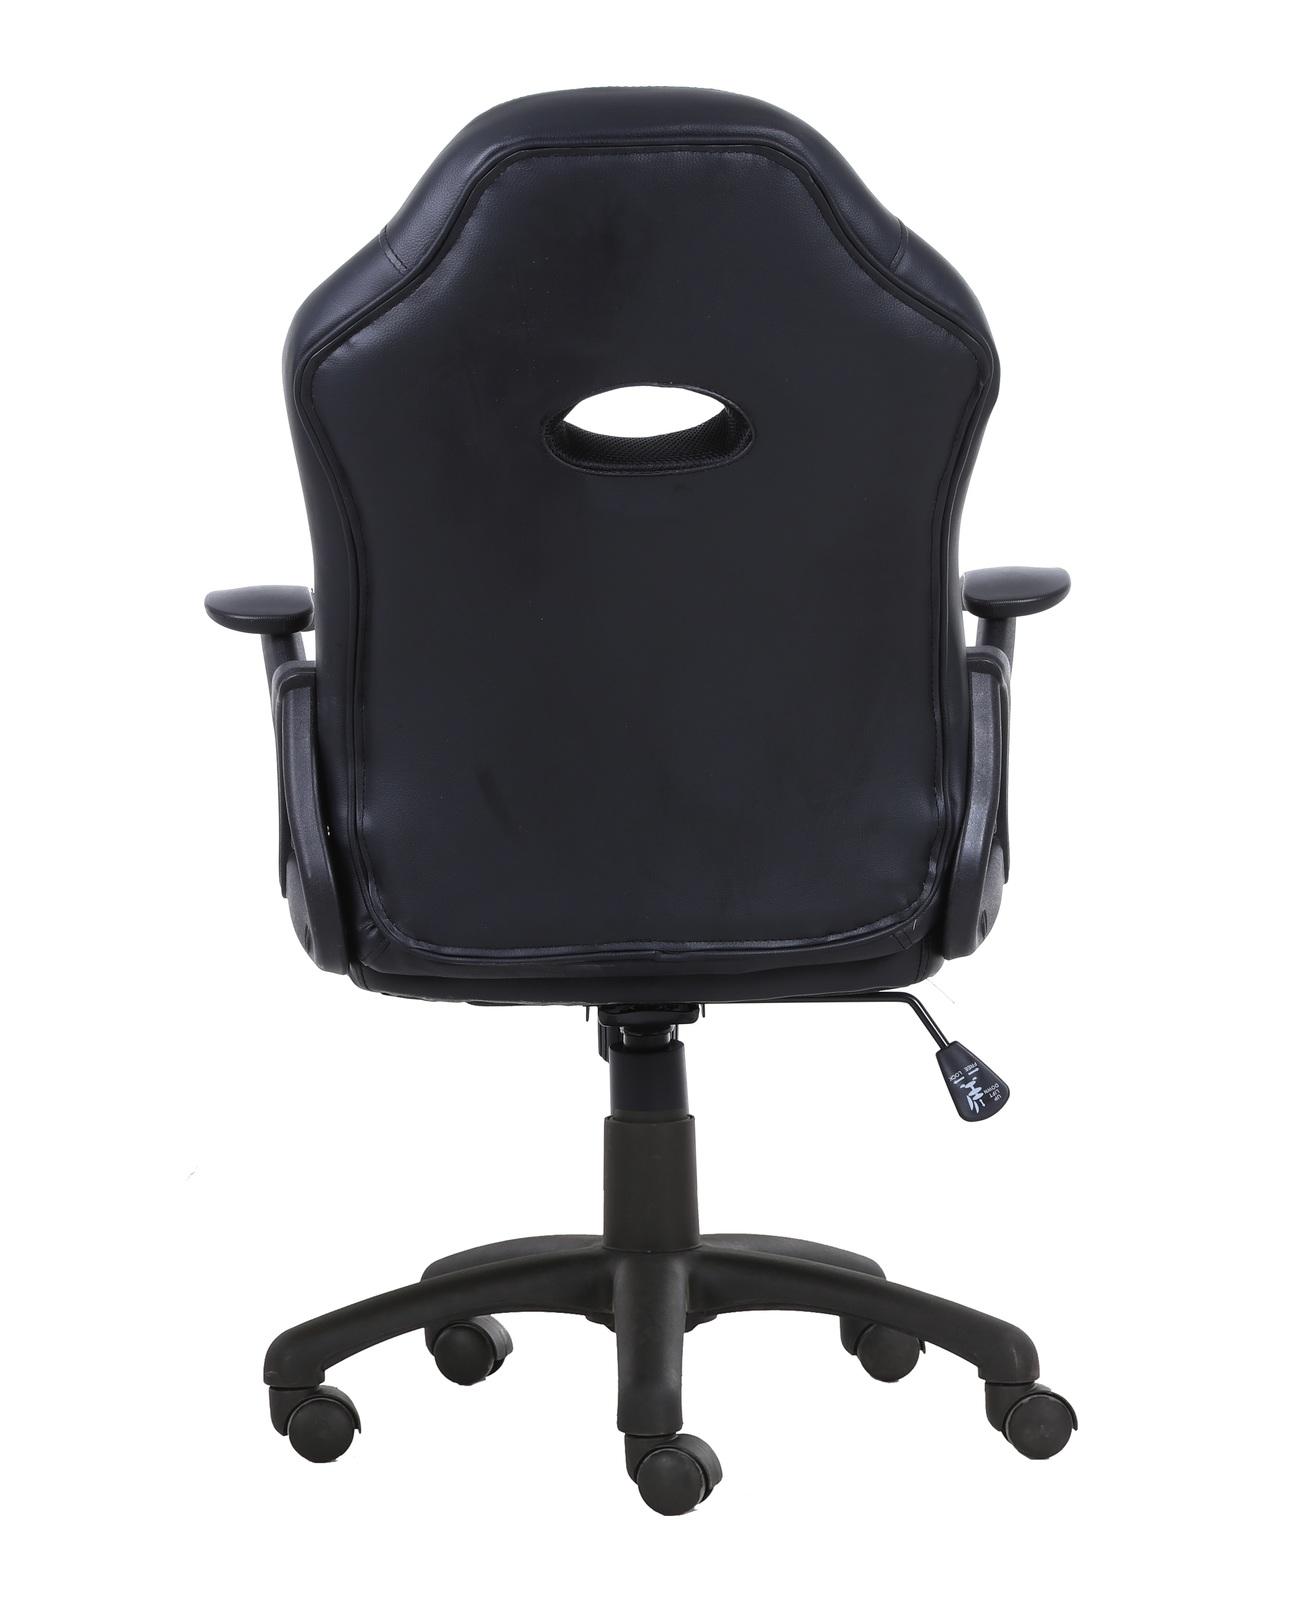 Gorilla Gaming Little Monkey Chair - Blue & Black for  image